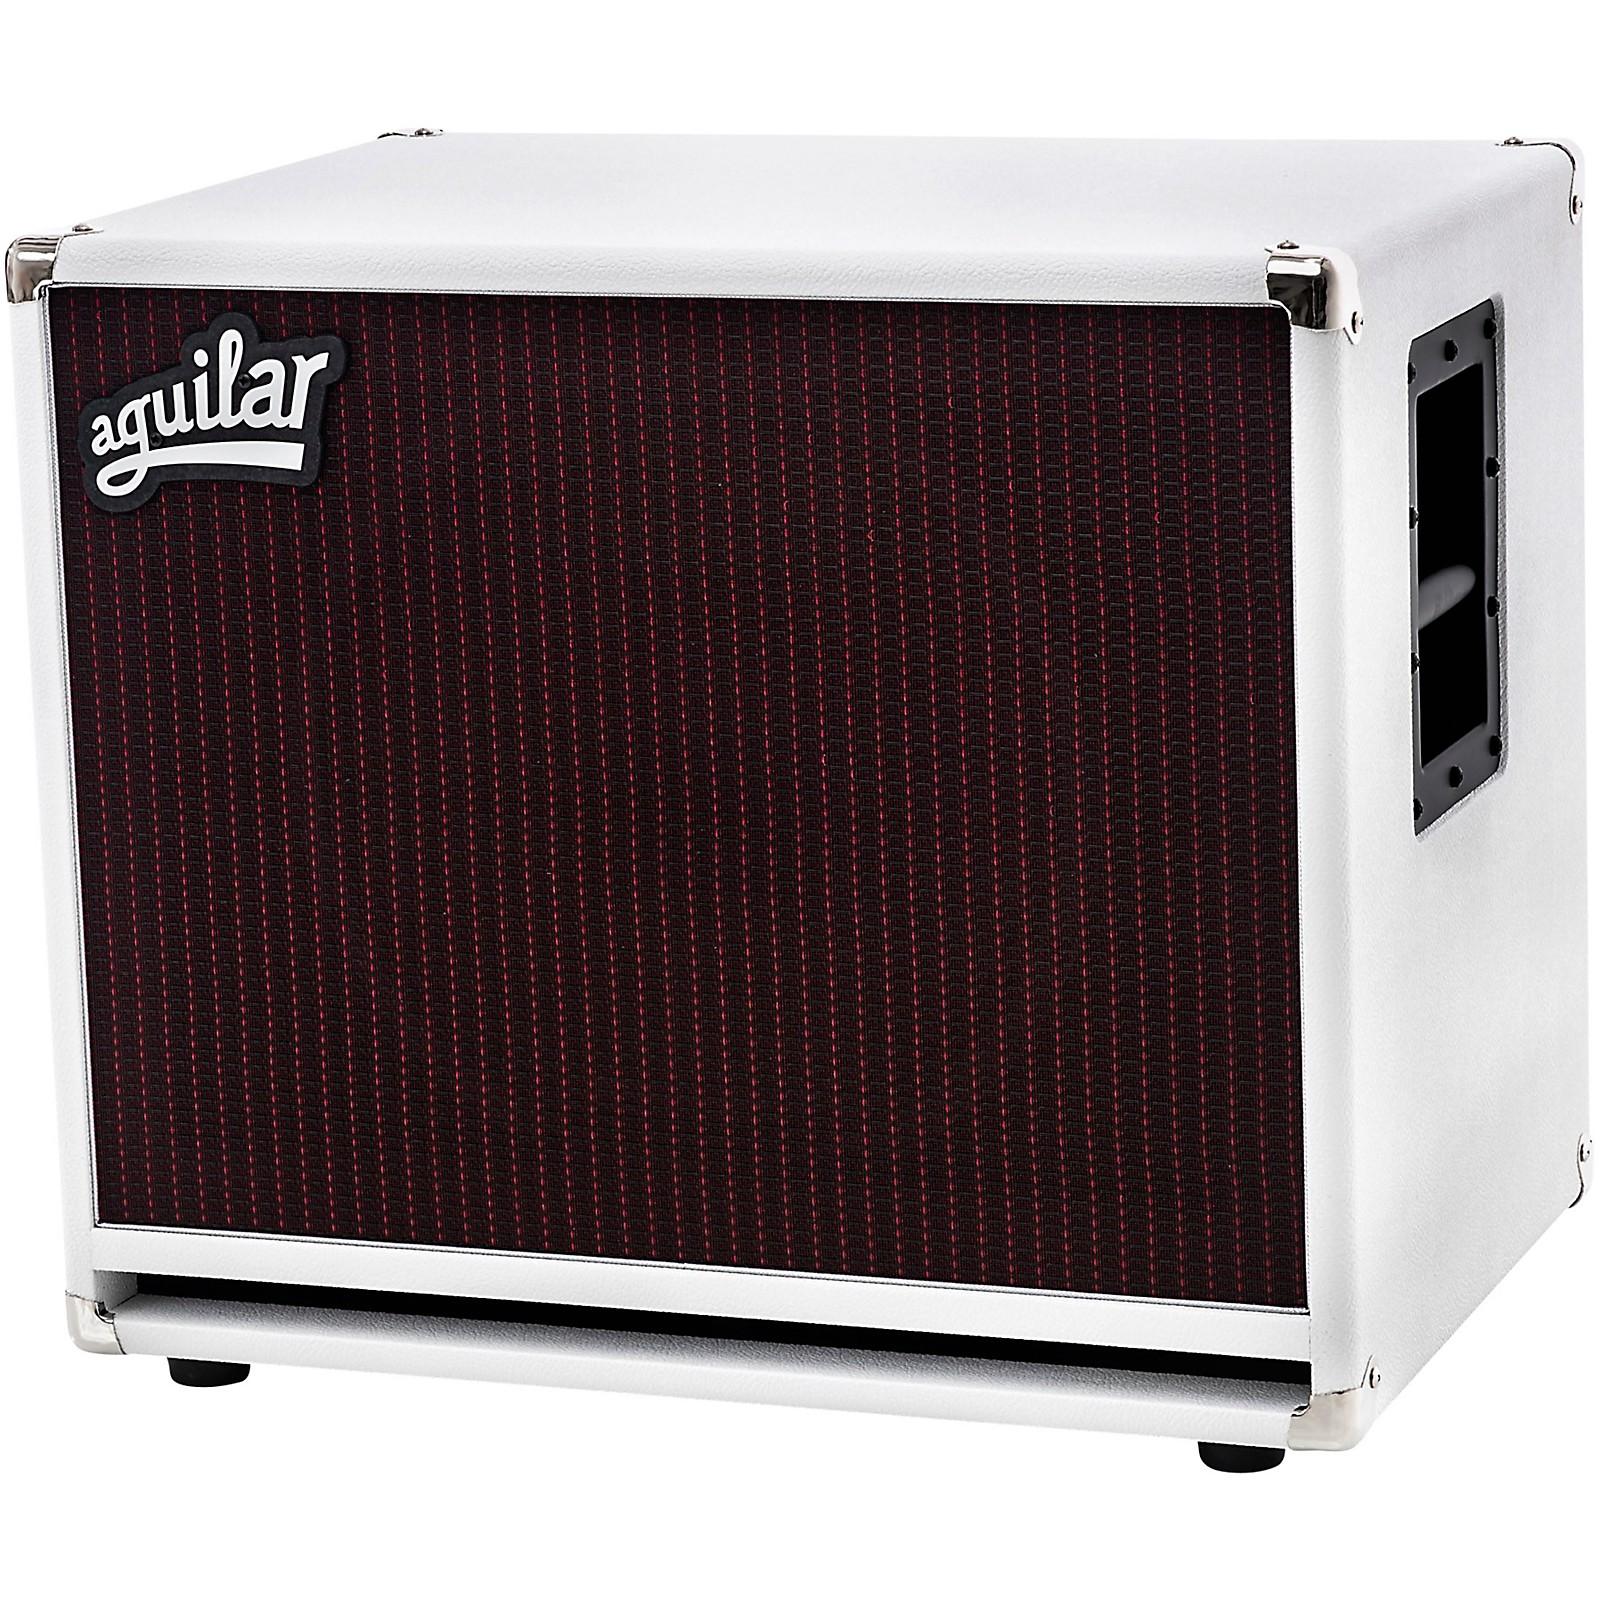 Aguilar DB 115 White Hot 400W 1x15 Bass Speaker Cabinet - 8 ohm